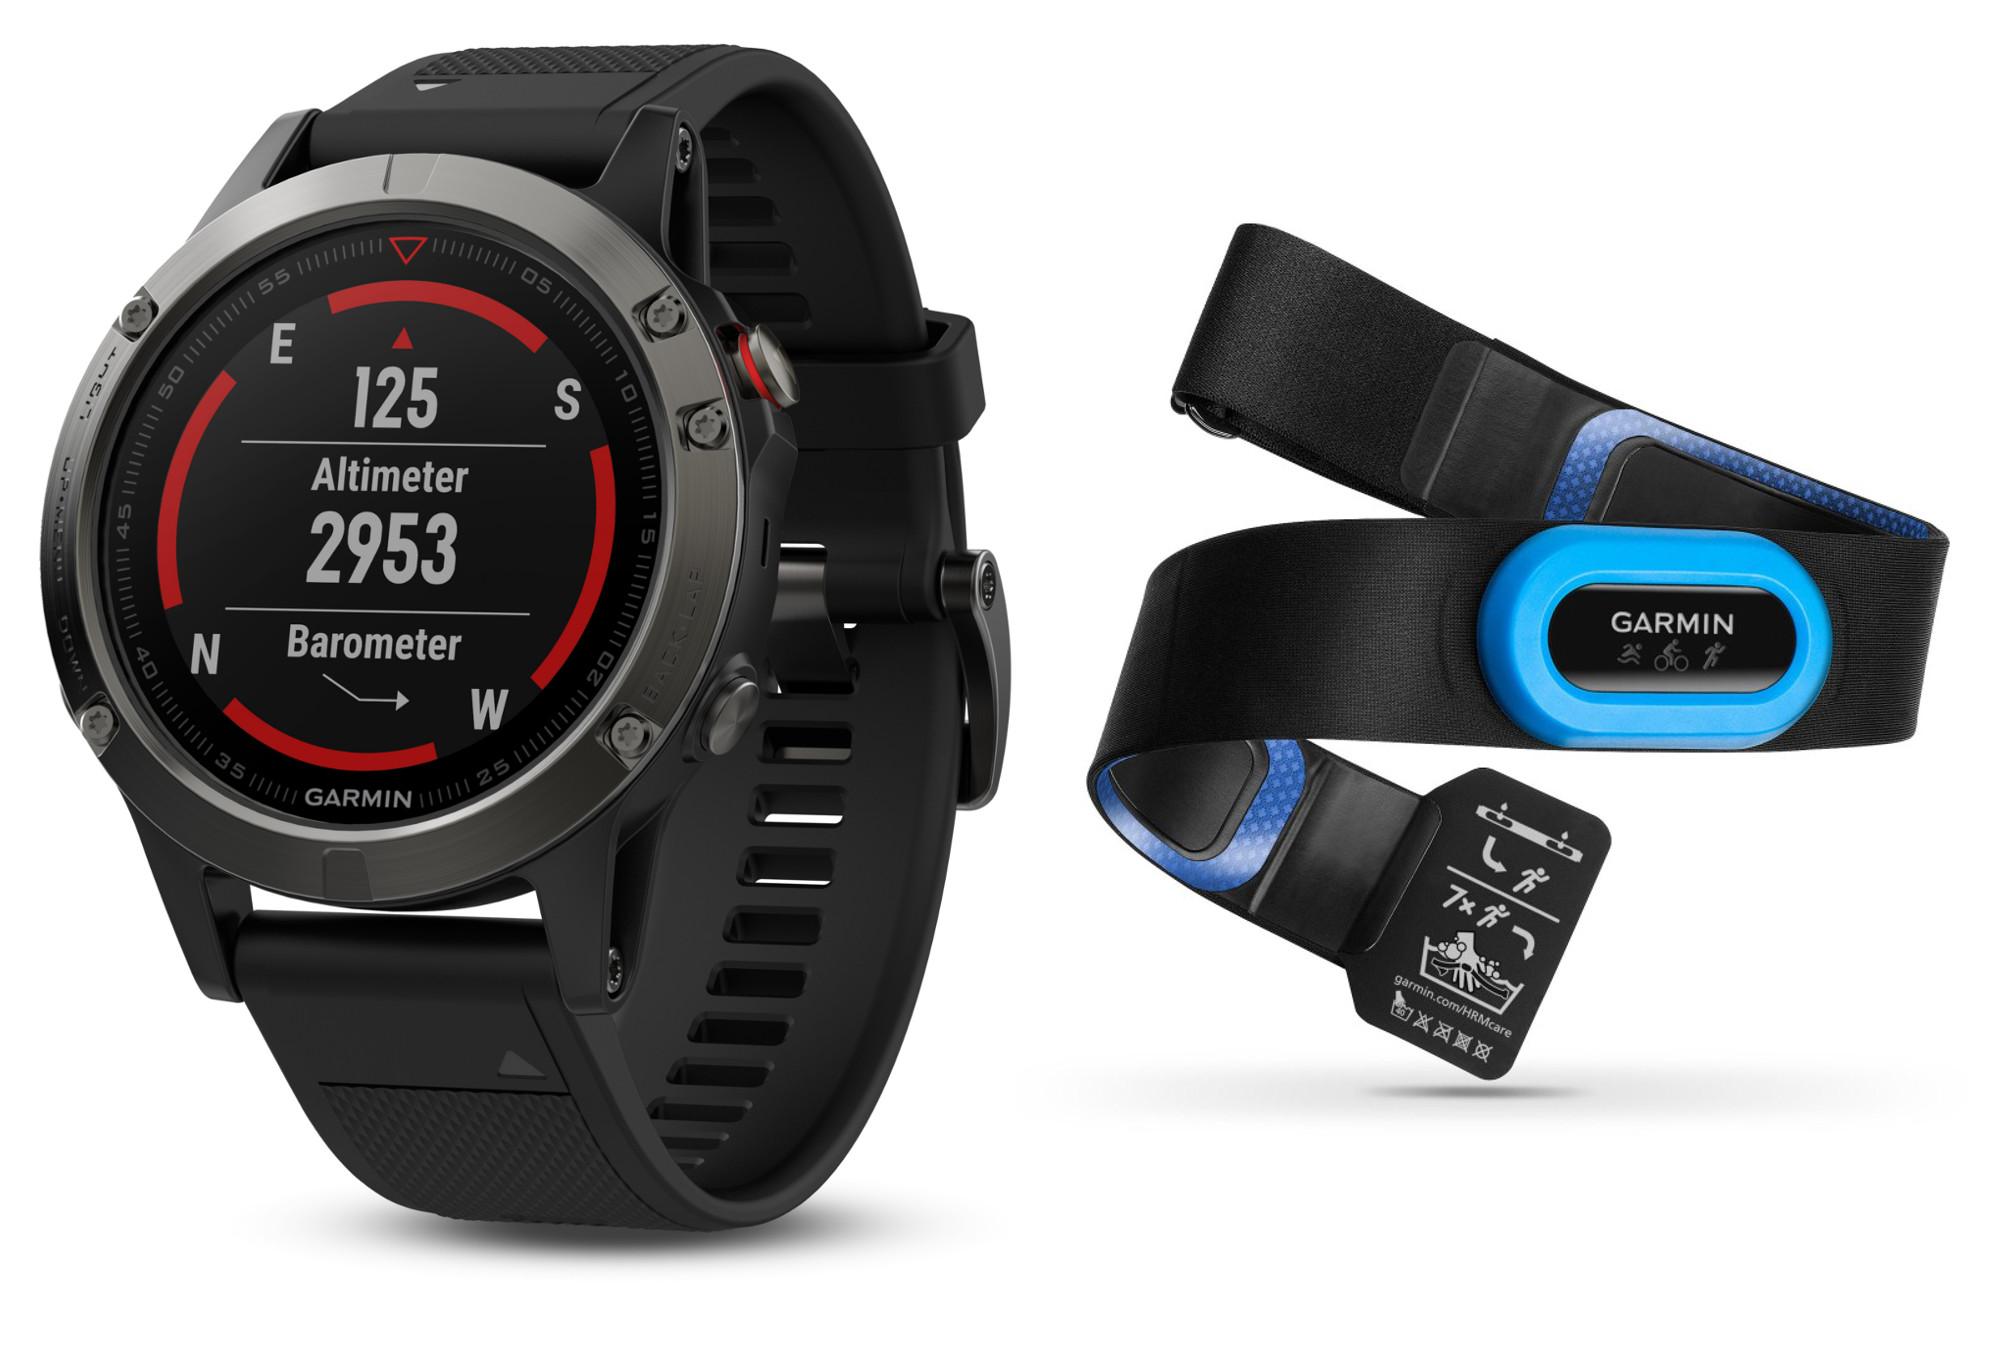 360c5459779e Reloj GPS Garmin Fenix 5 Performer HRM-Tri Gris